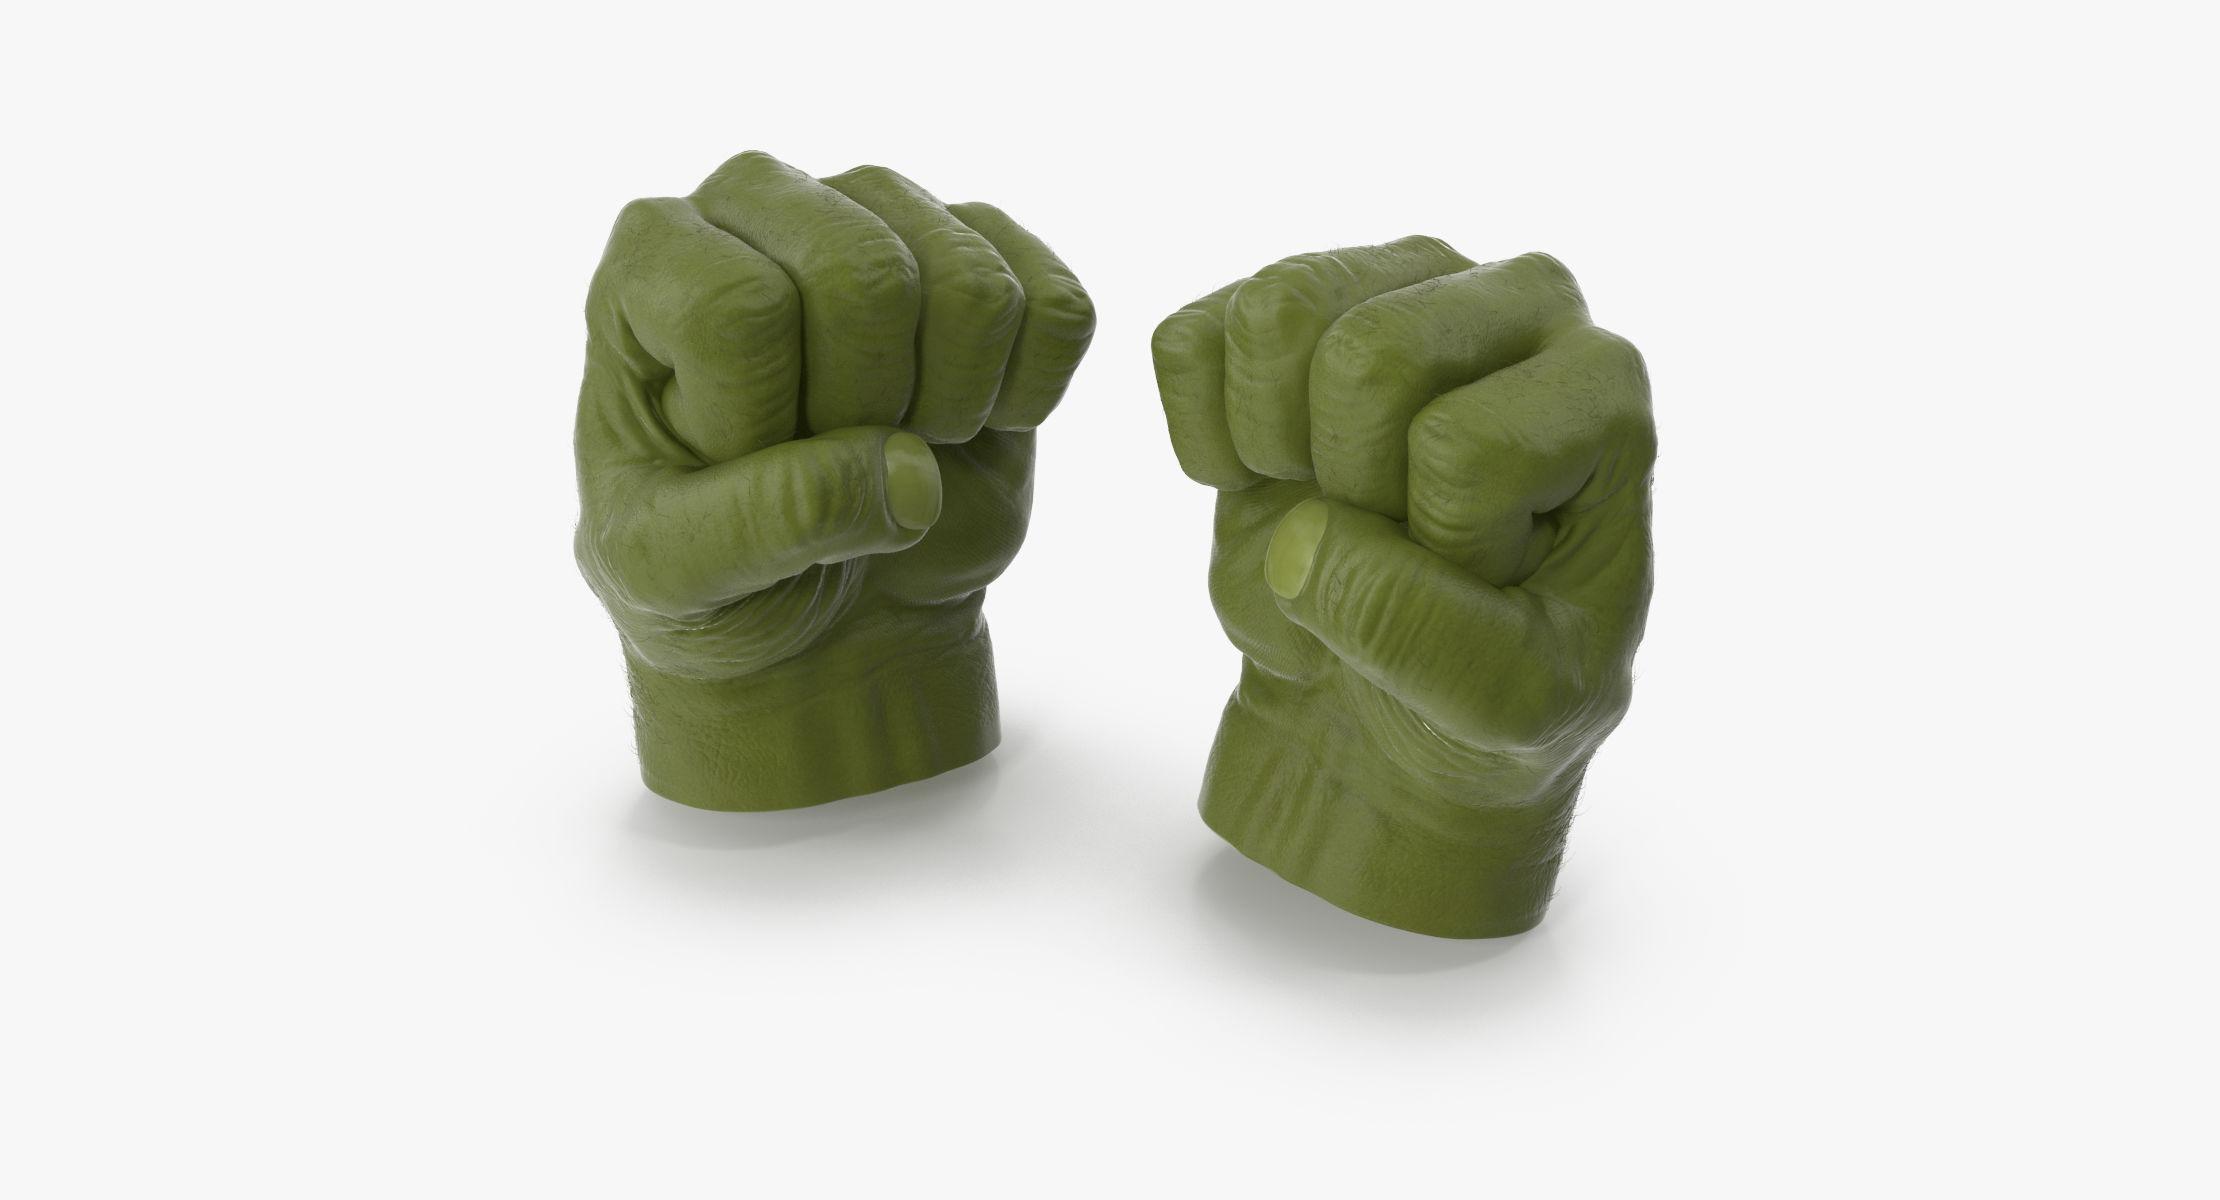 Hulk Hands Closed - reel 1